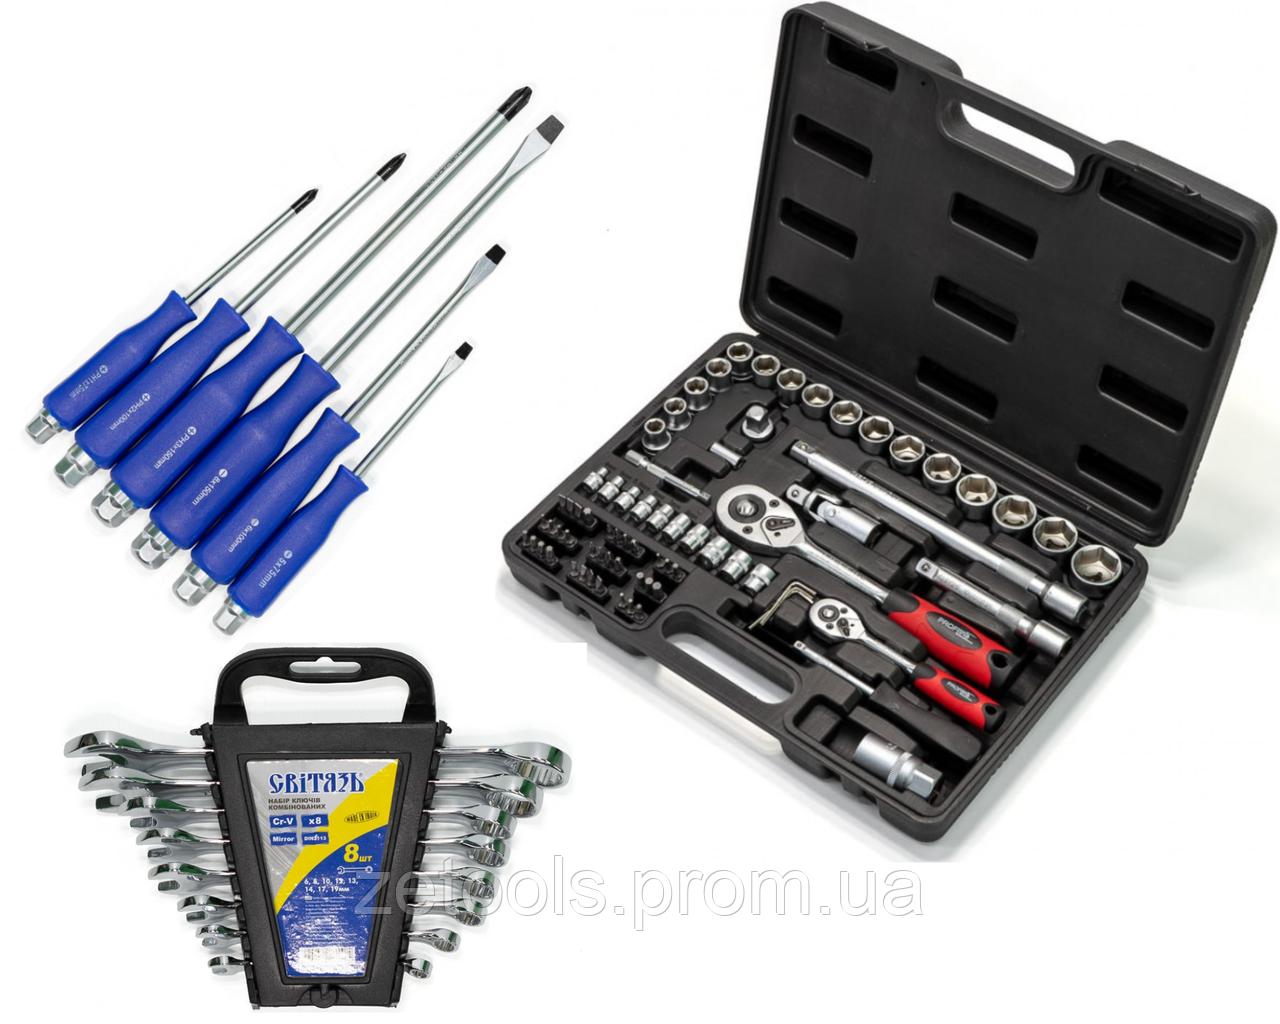 Набор инструмента  72 ед. PROFLINE 60725 + Ключи 8 ед.+Комплект отверток ударных 6 шт